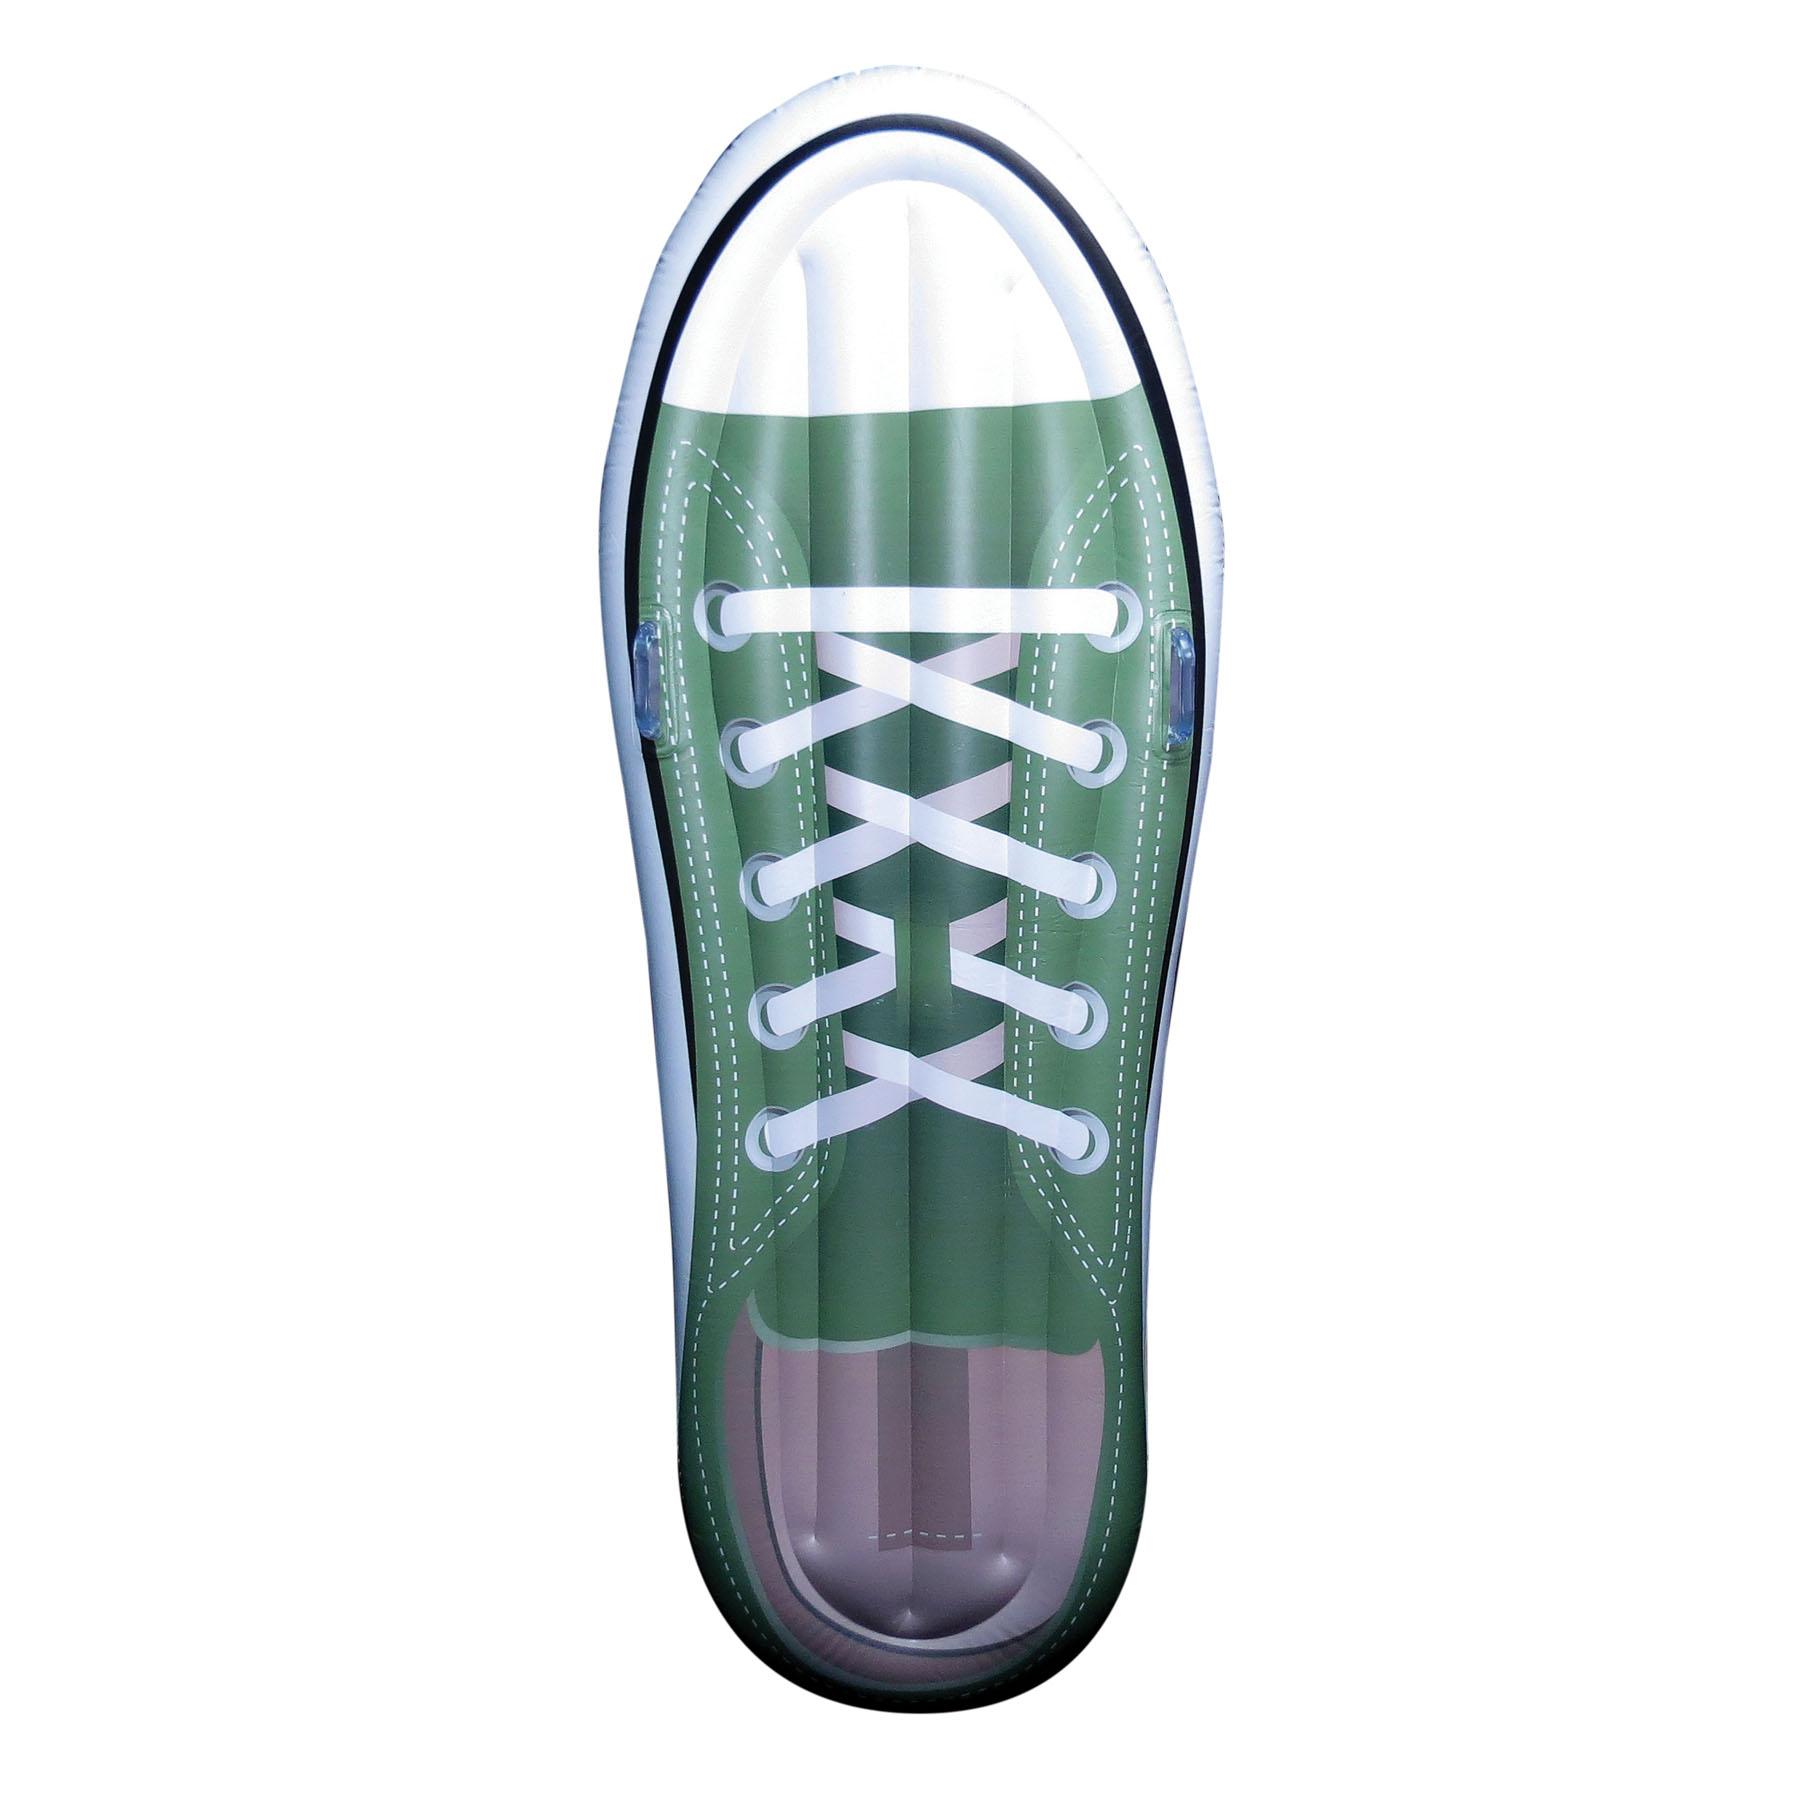 Jet Creations FUN-SNEAKER01 Sneaker Pool Float